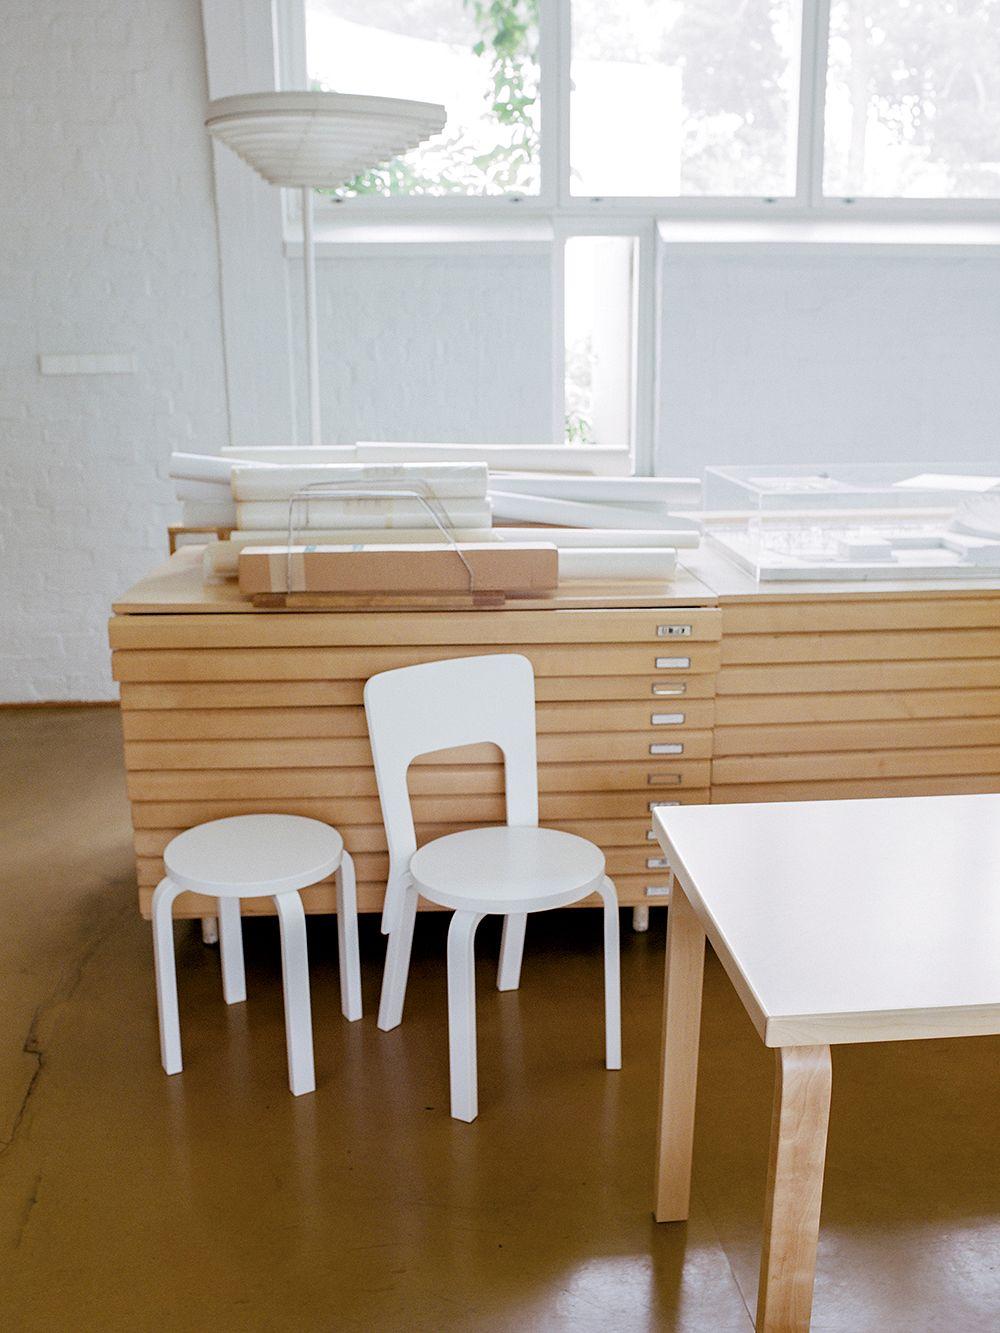 Franckly Artek chairs